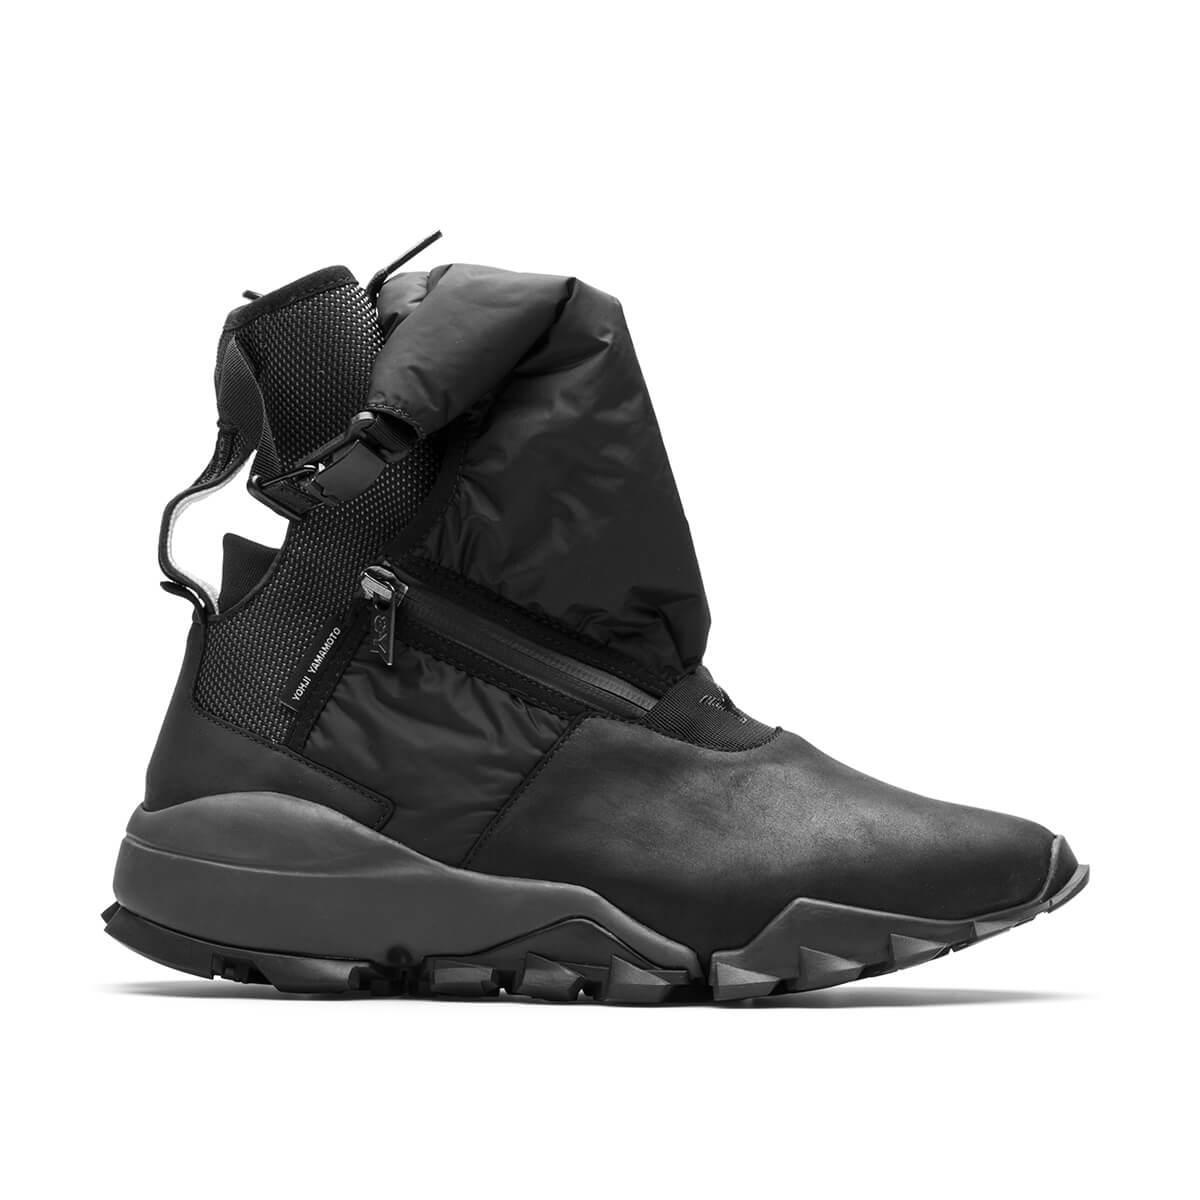 c6e95b2e4 Y-3 Ryo High Sneakers in Black for Men - Lyst